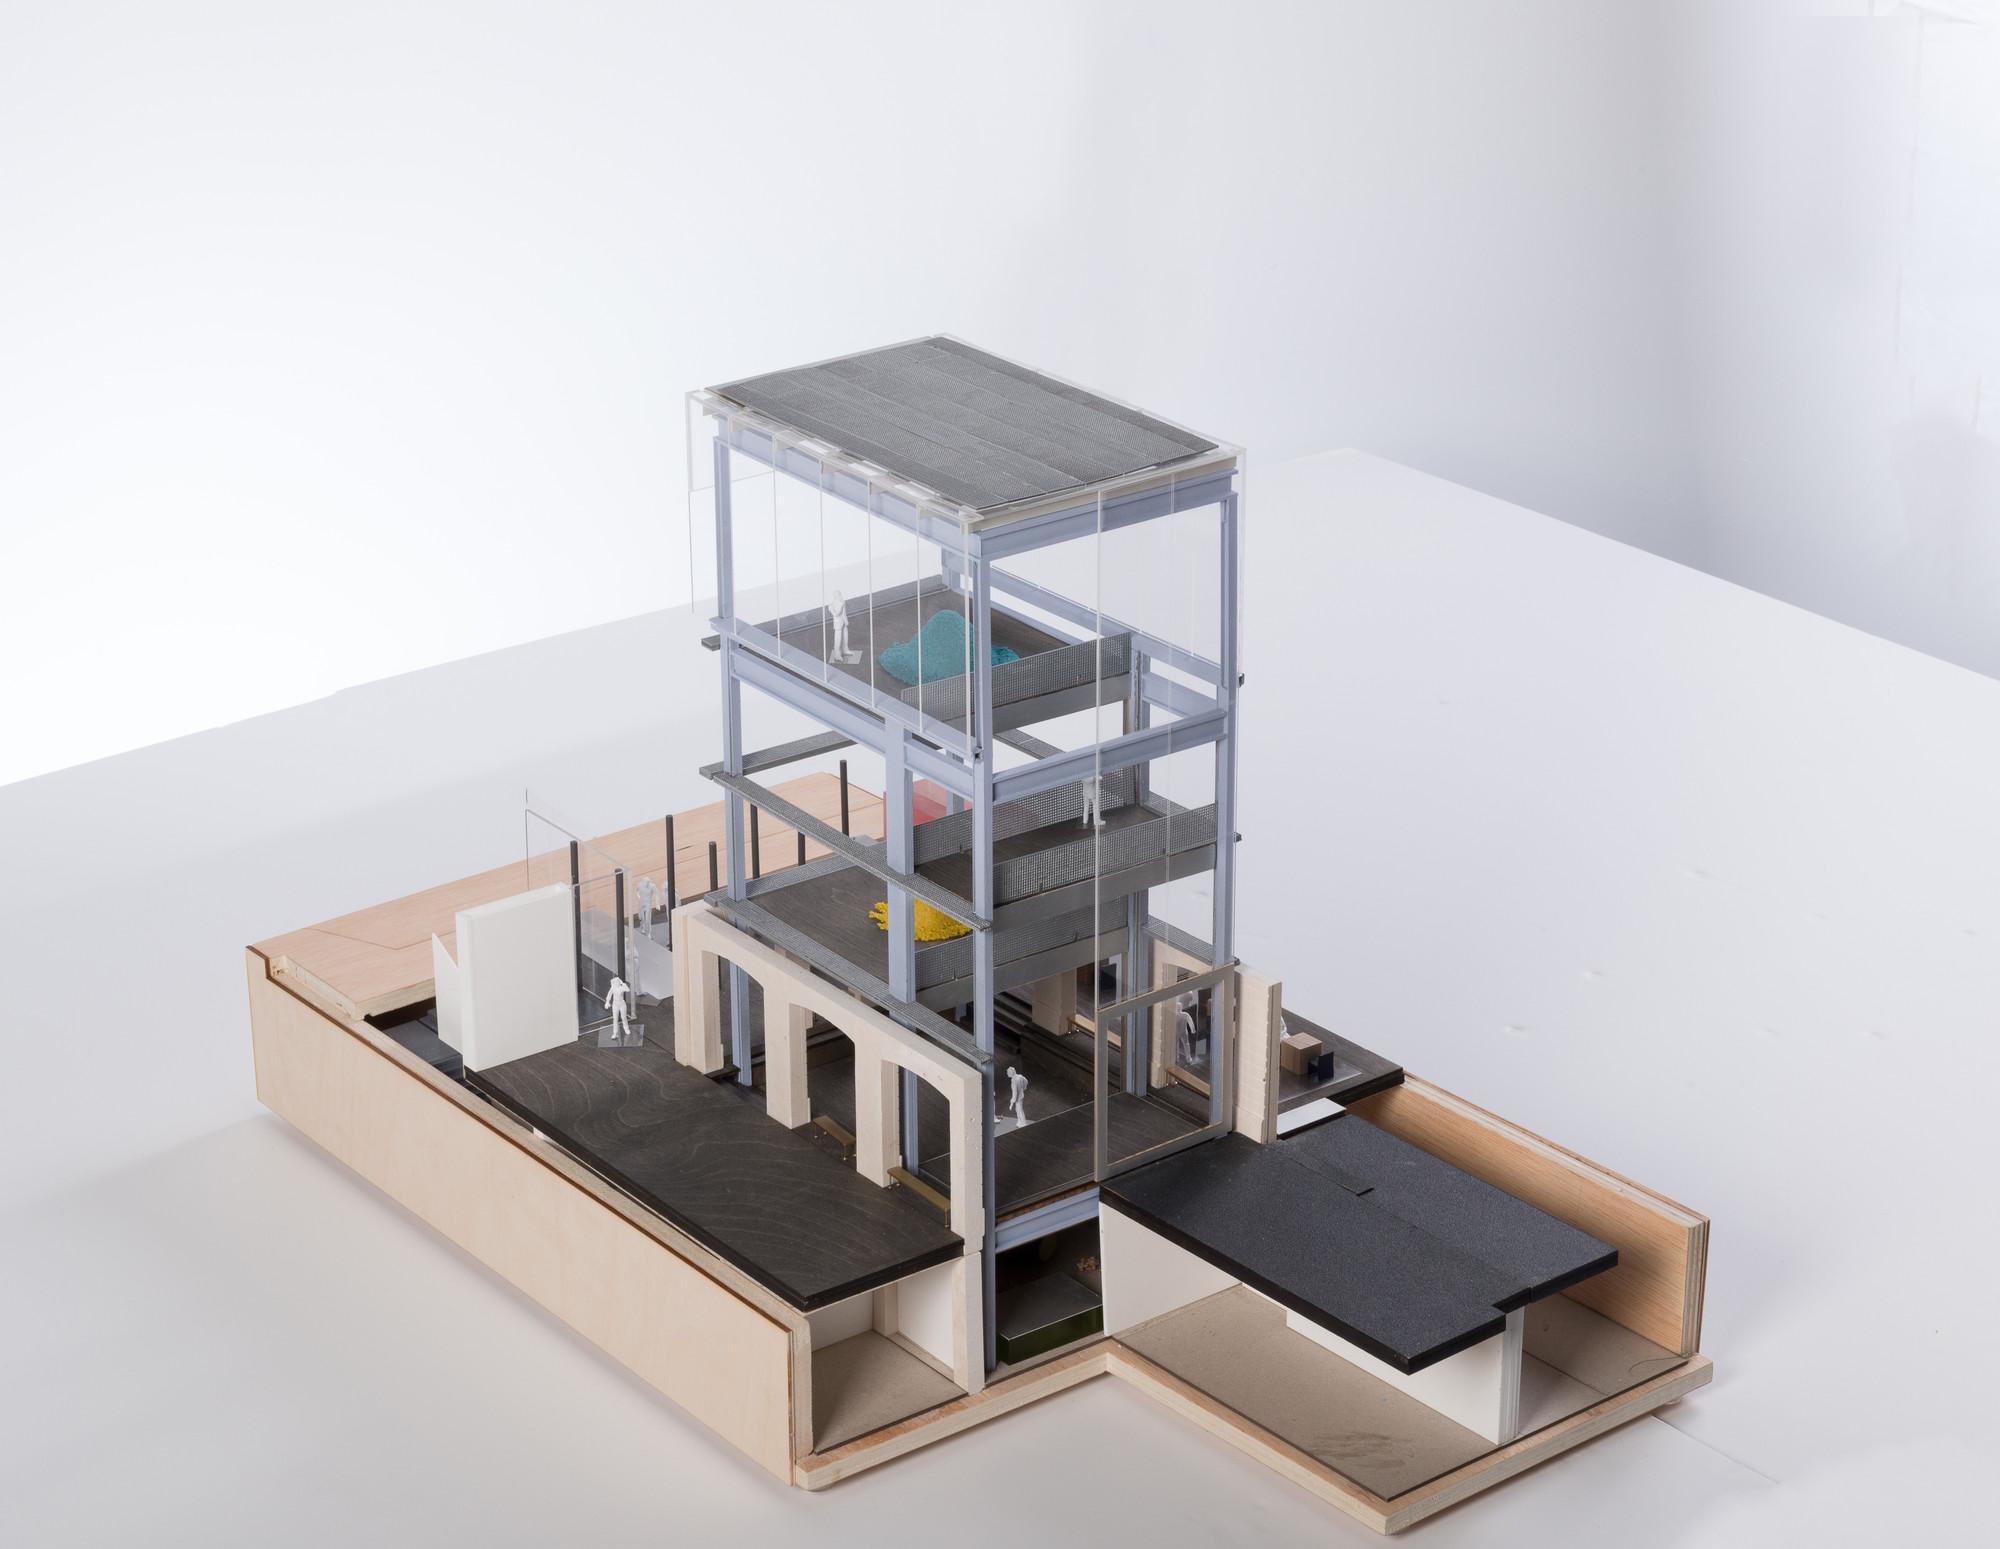 Primer piso, sótano, torre de exposiciones, Modelo 1-50e. Imágen © OMA / Frans Parthesius